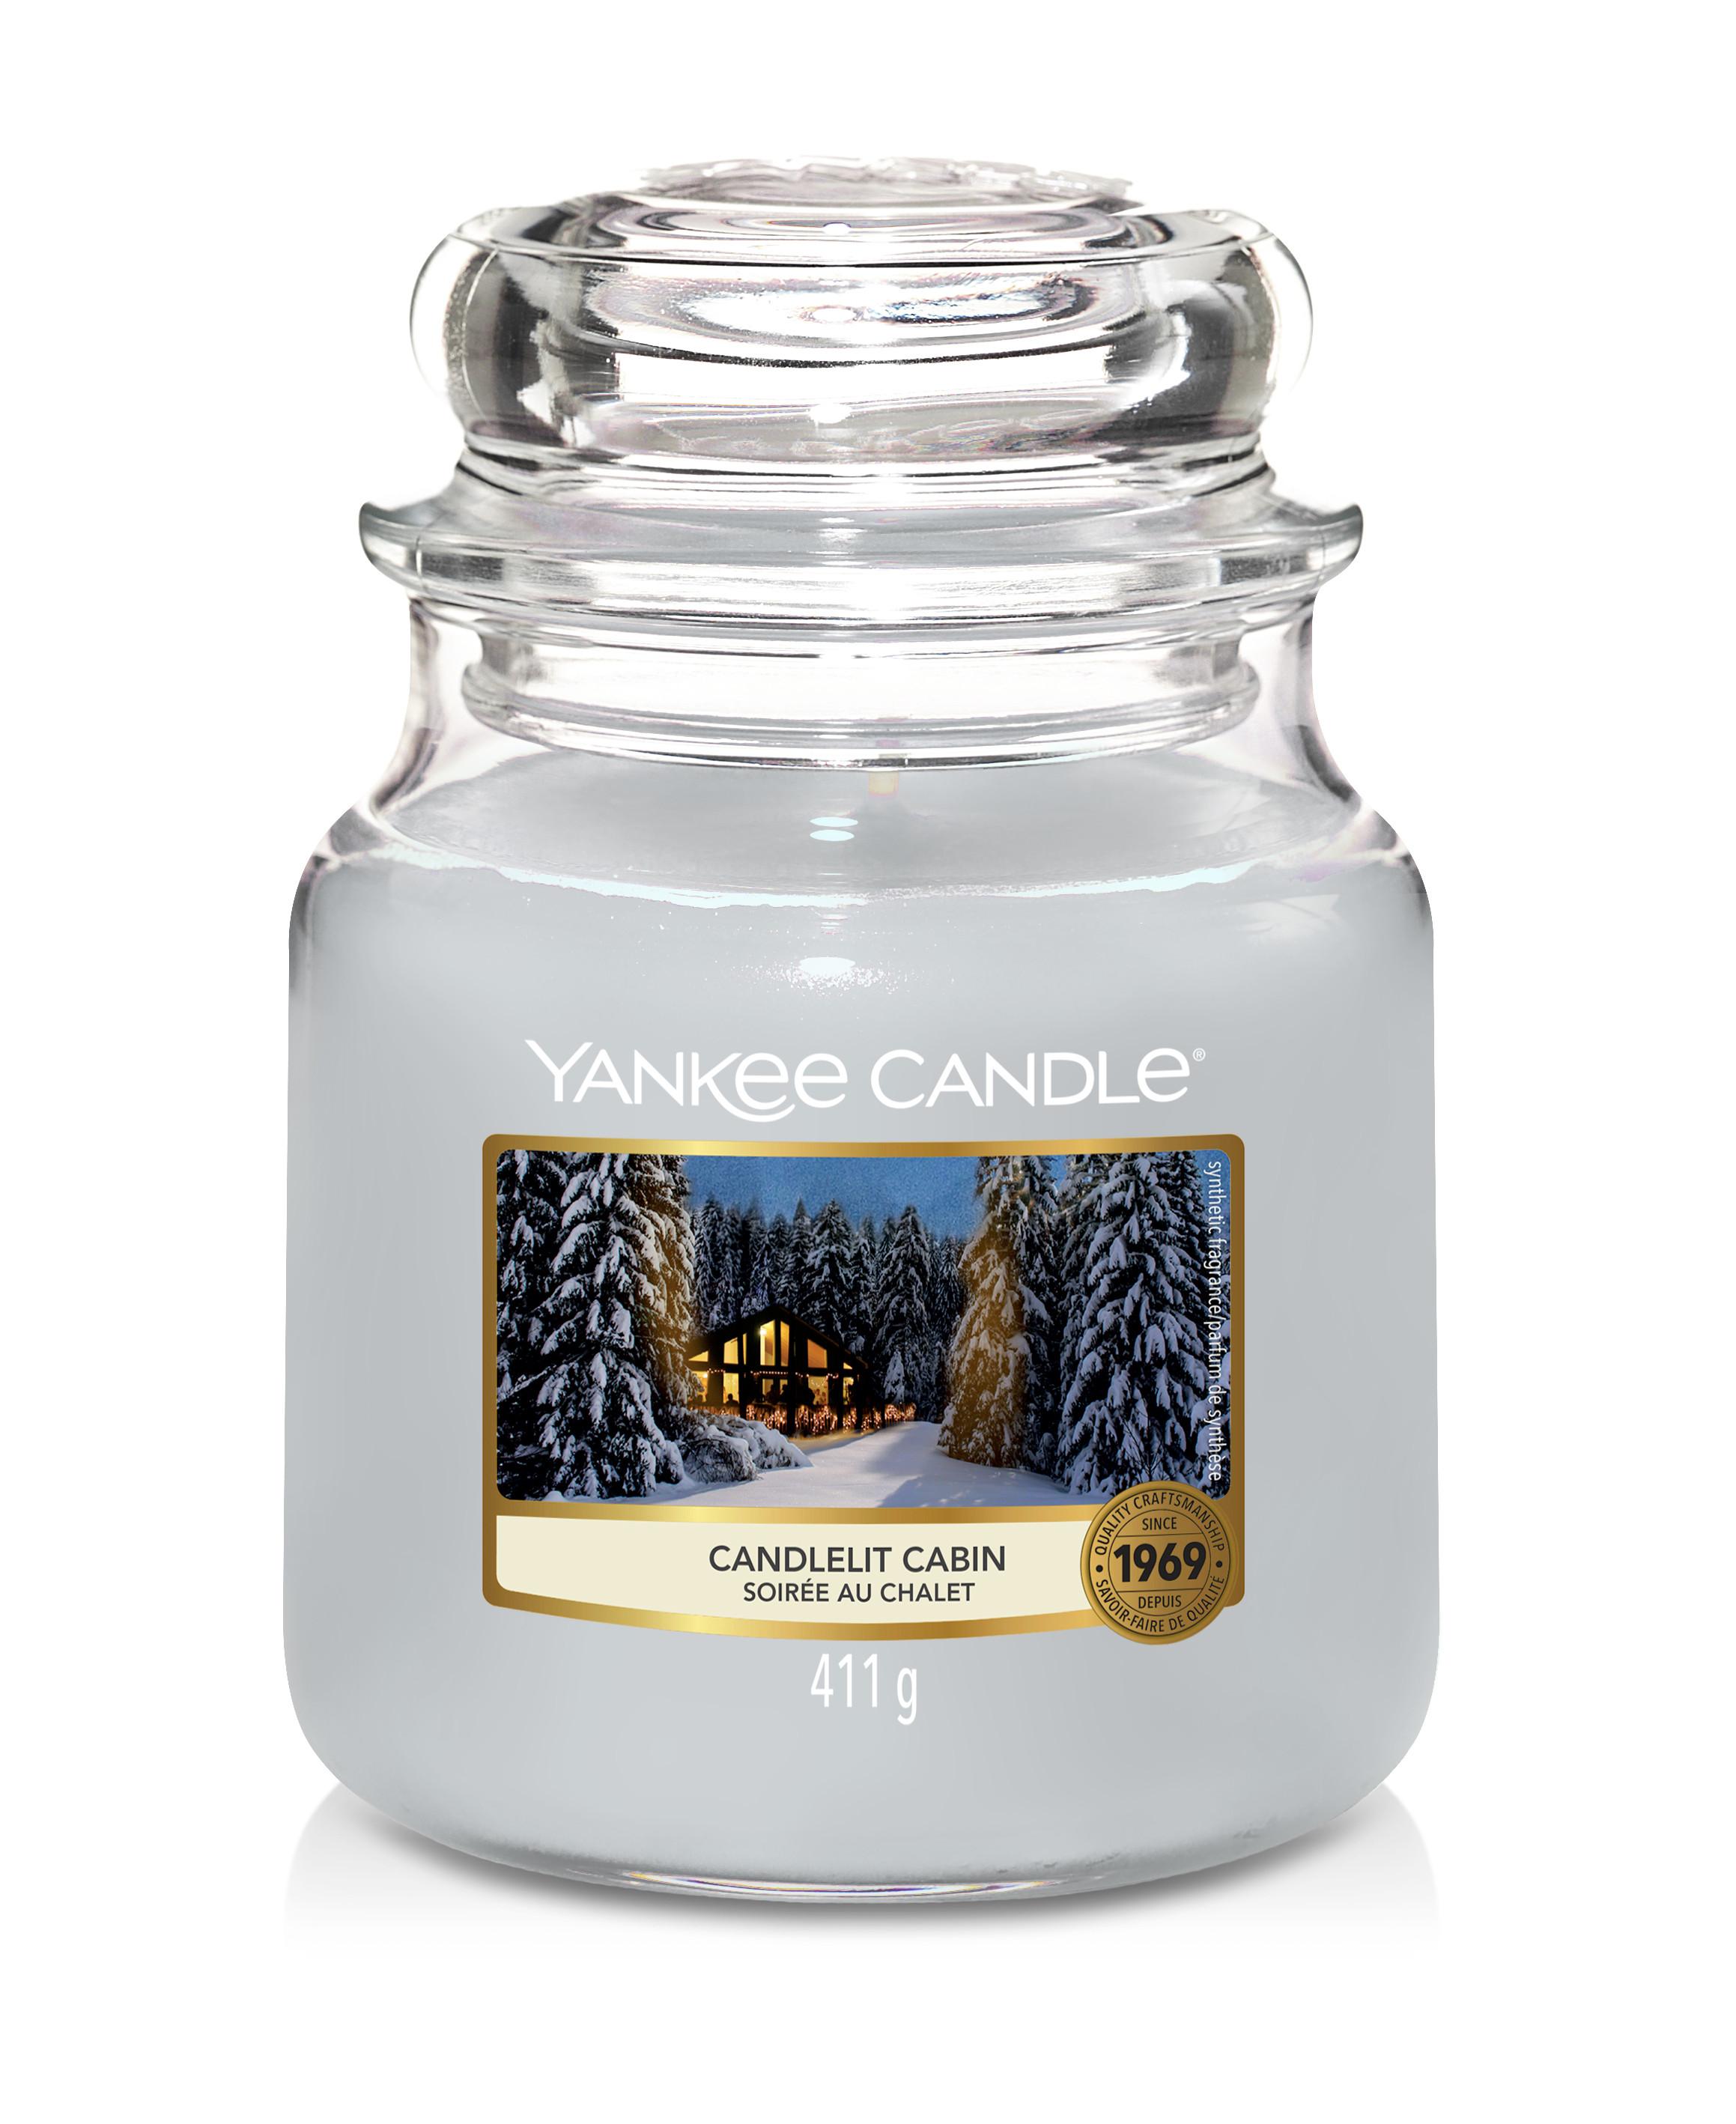 Candlelit Cabin